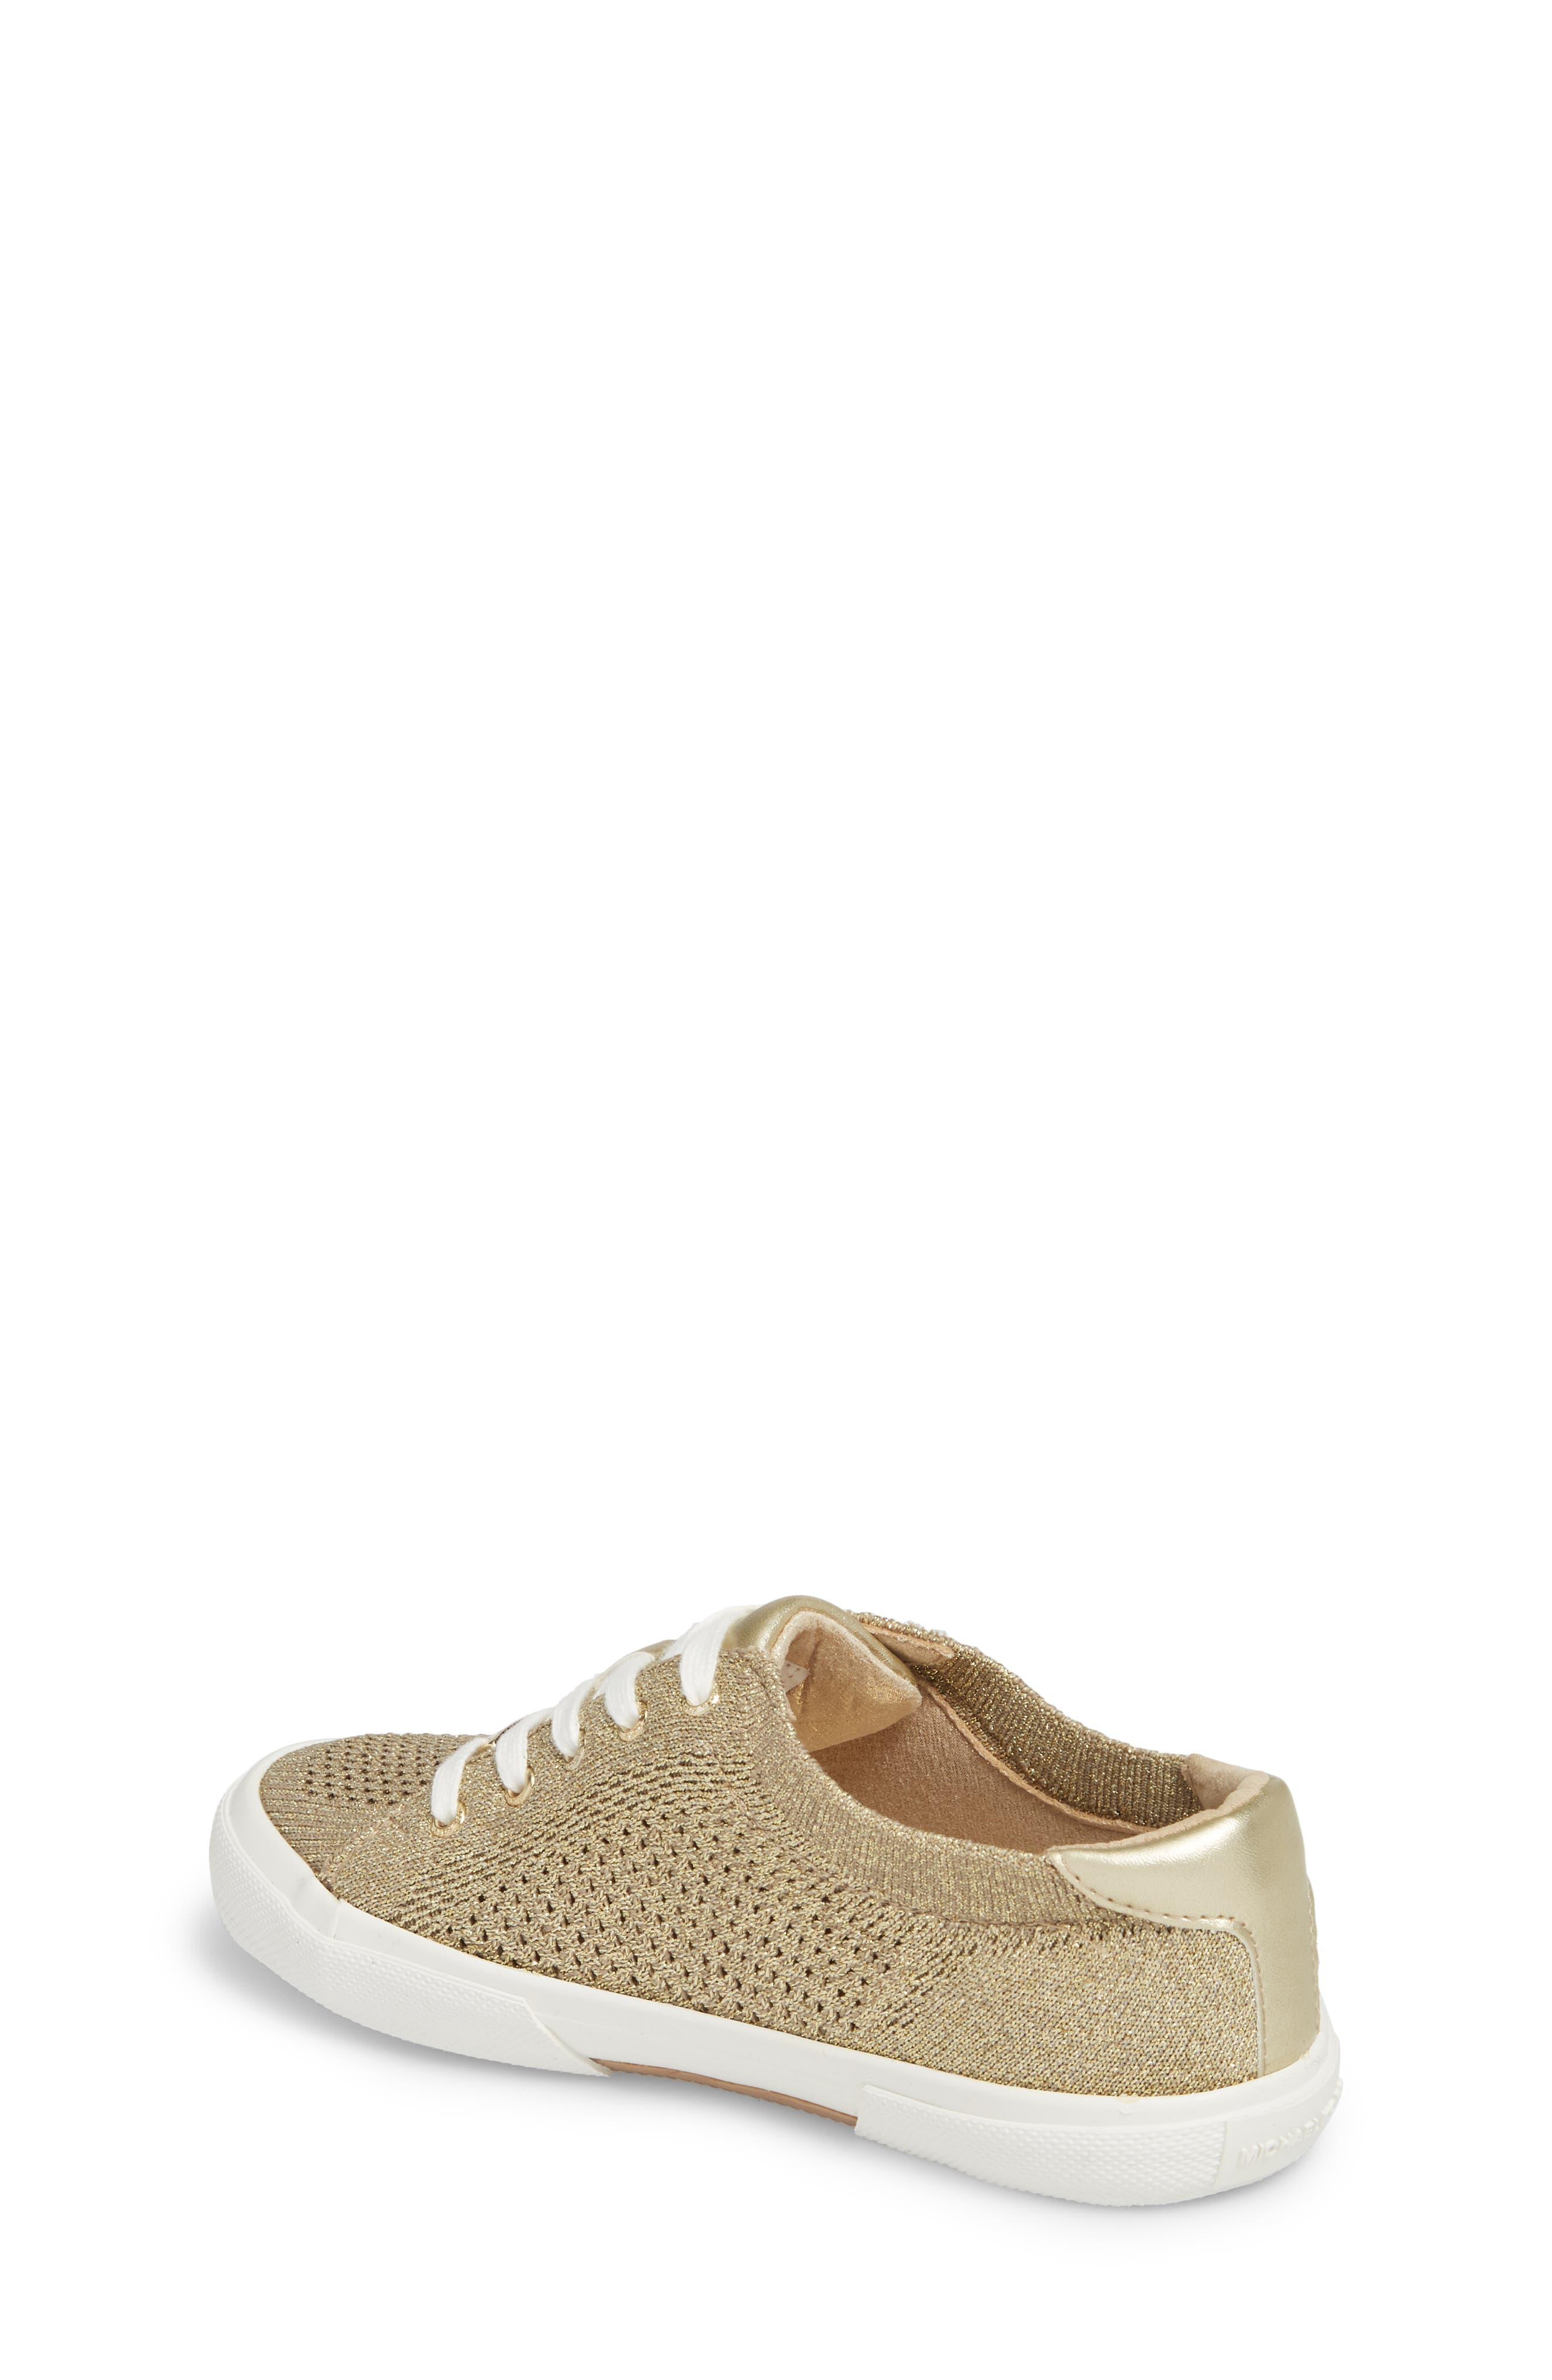 Ima Metallic Knit Sneaker,                             Alternate thumbnail 2, color,                             Gold